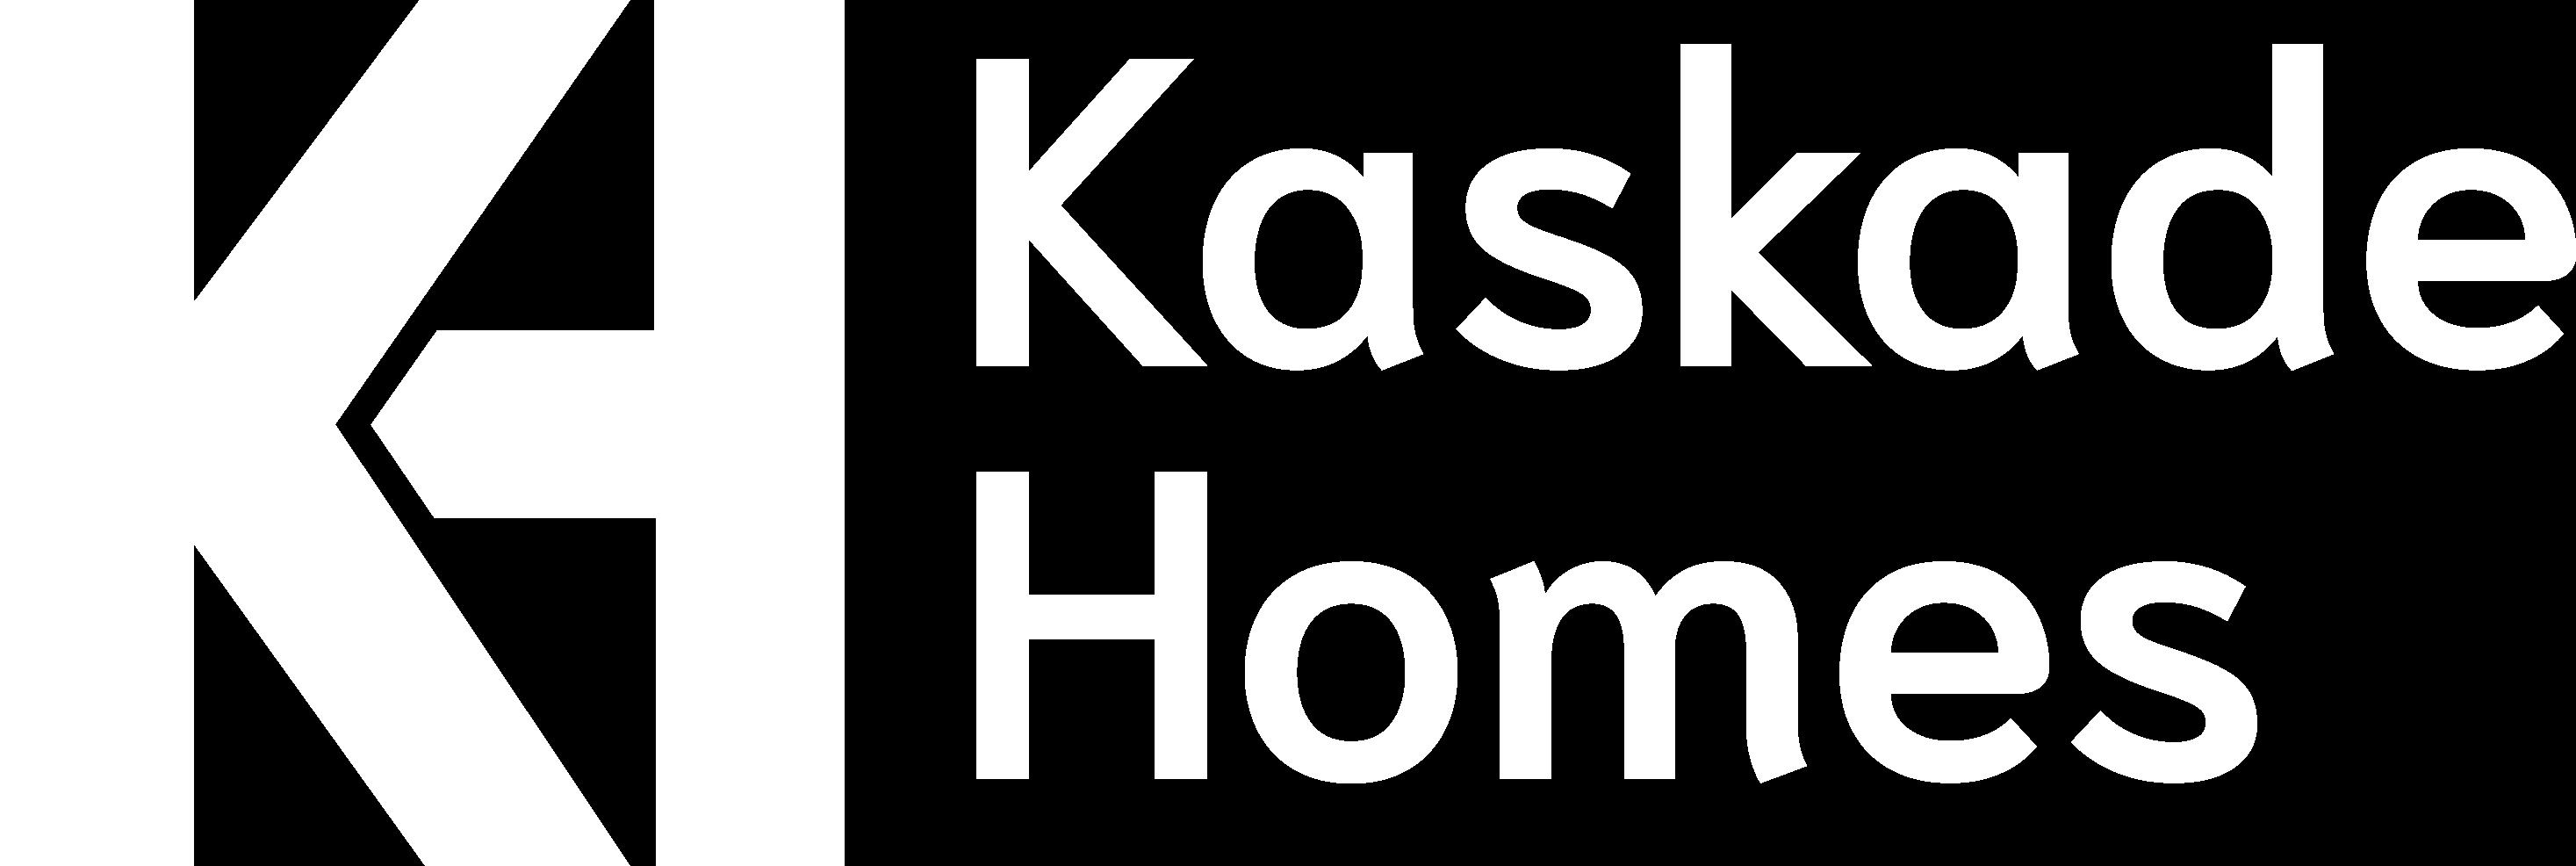 Kaskade Homes